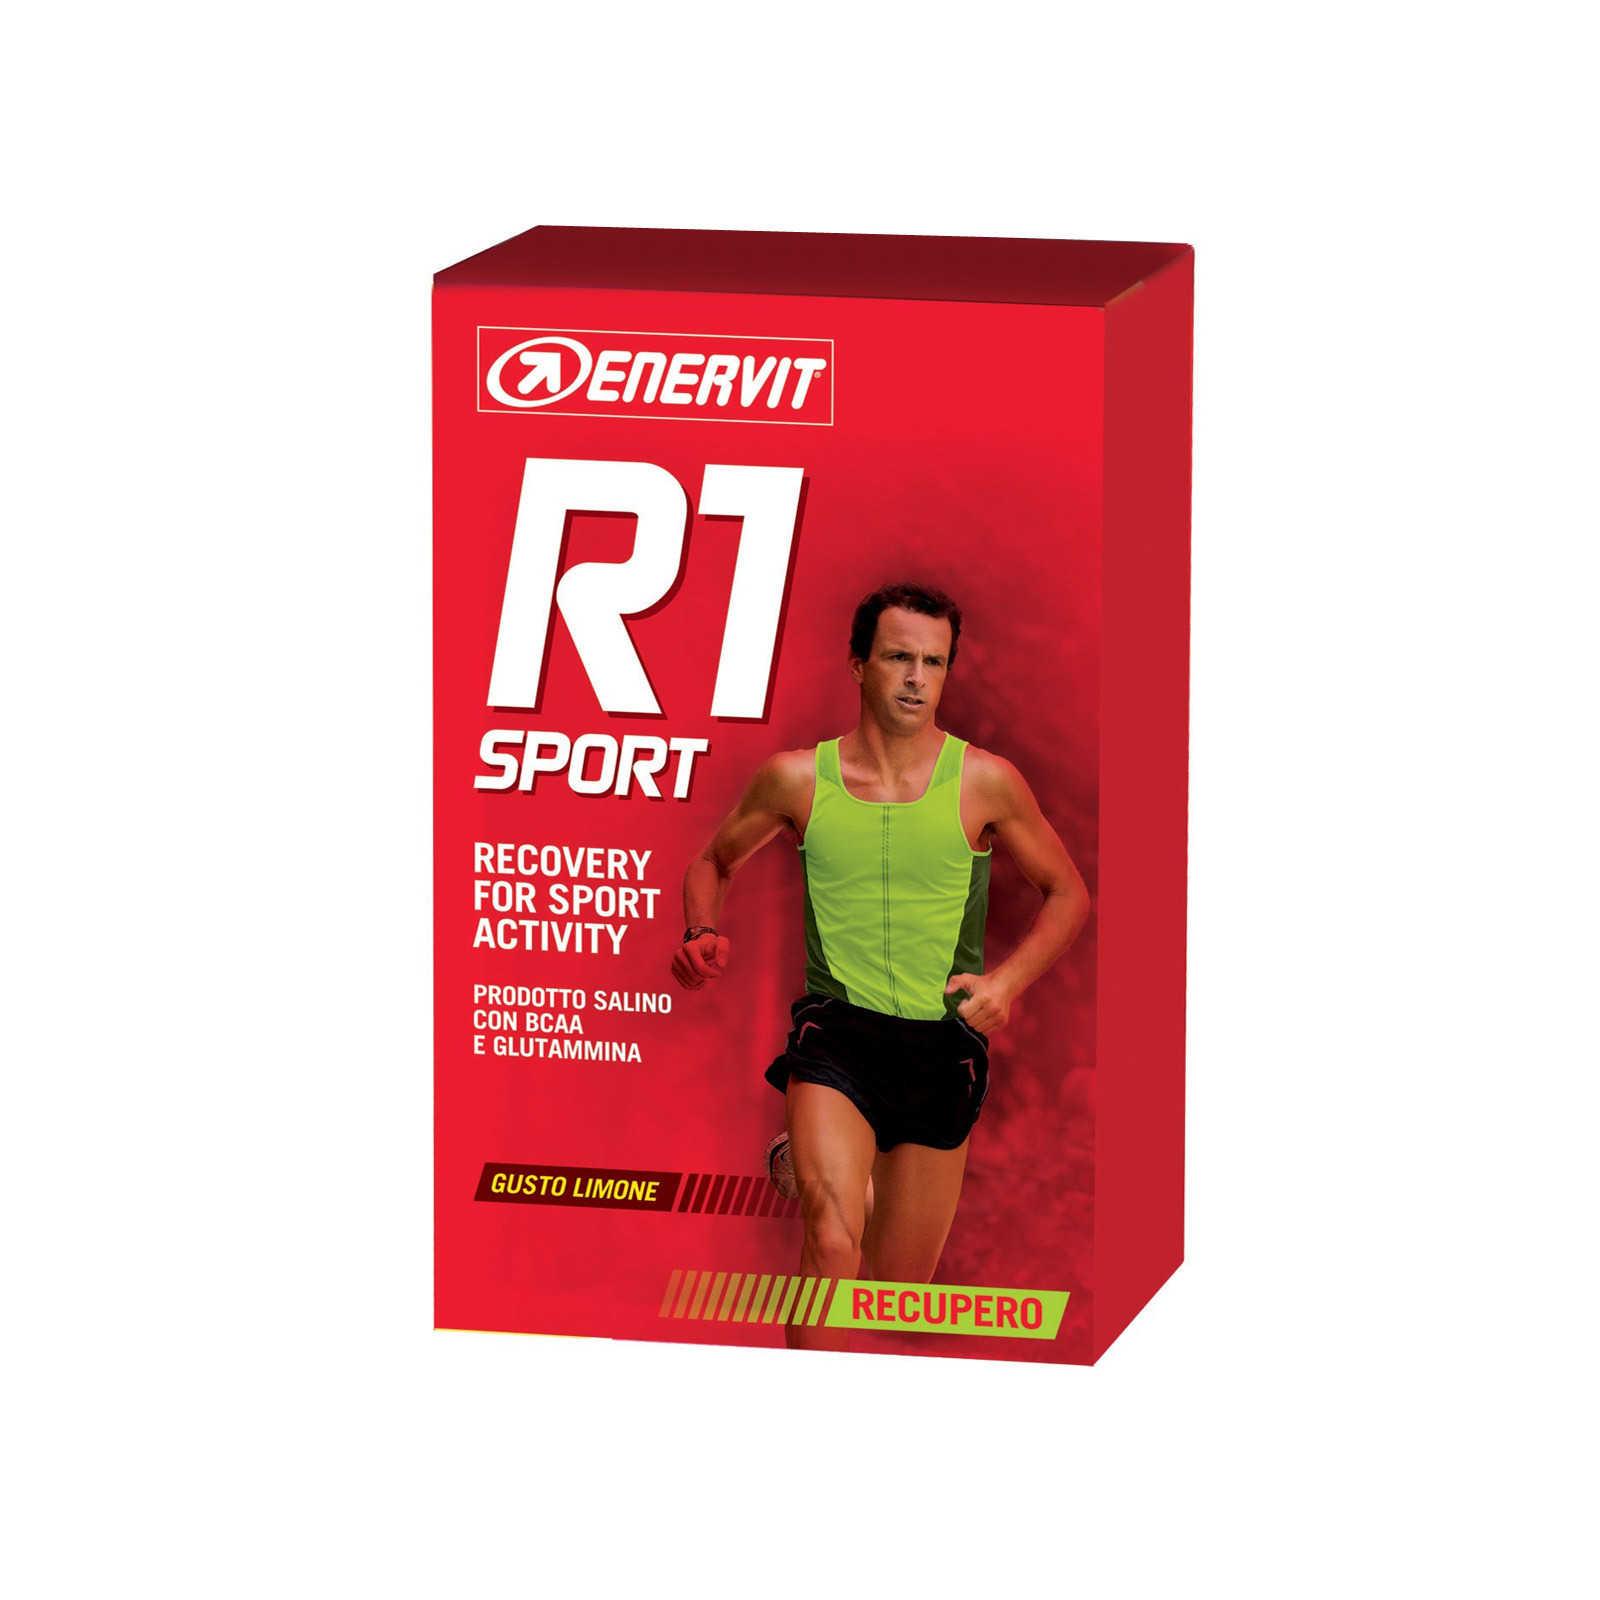 Enervit - R1 Sport - Bustine gusto limone